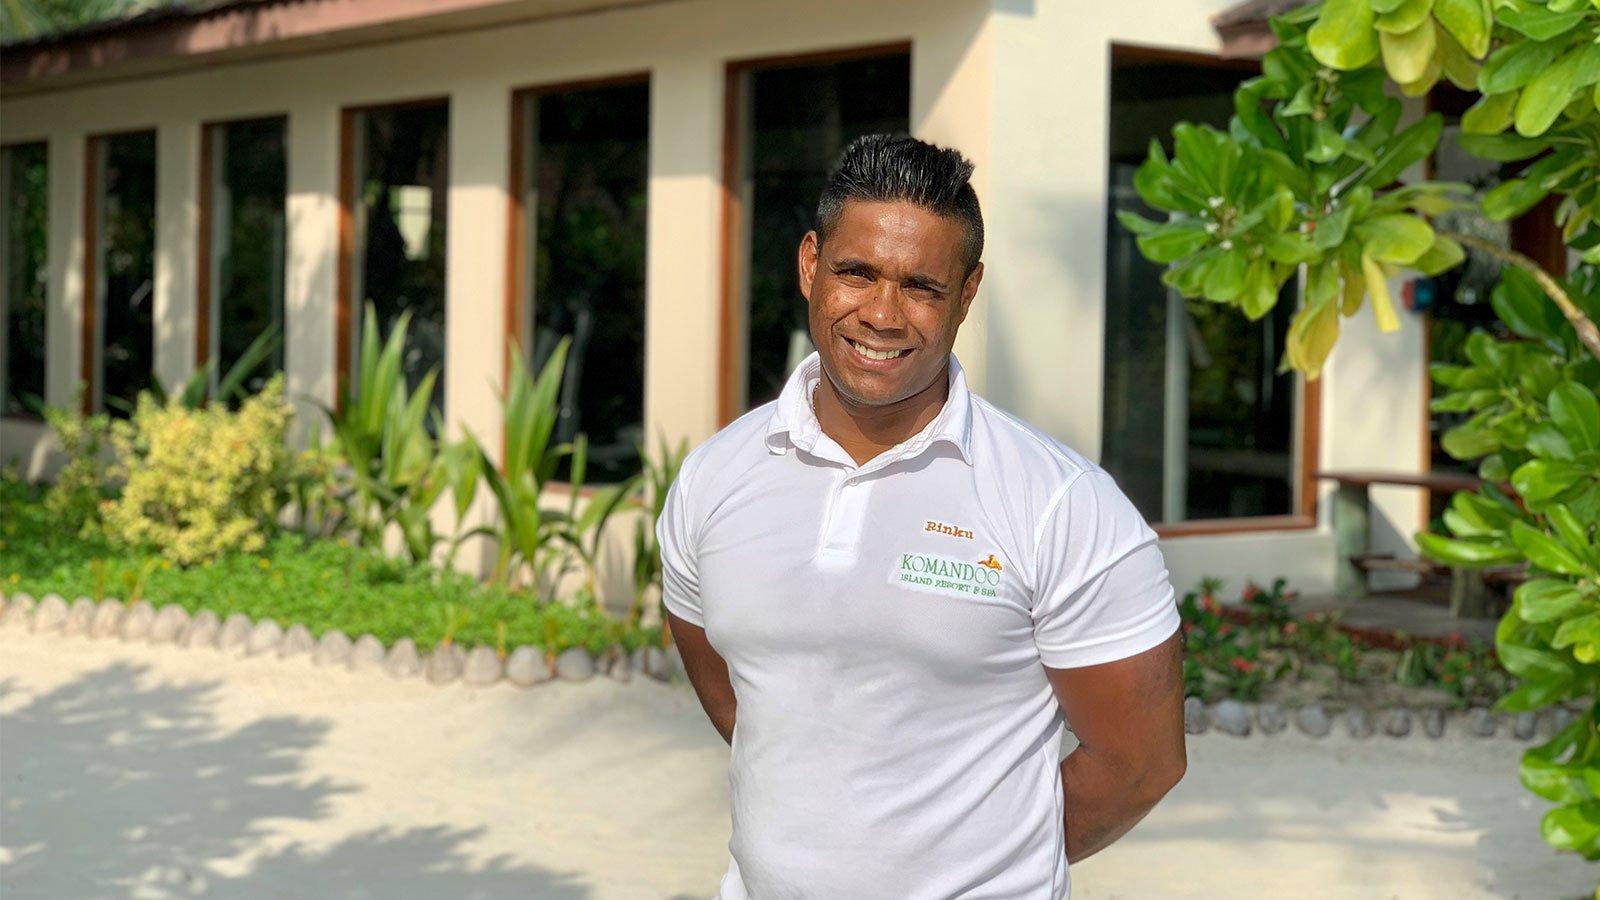 Rinku gym instructor komandoo maldives